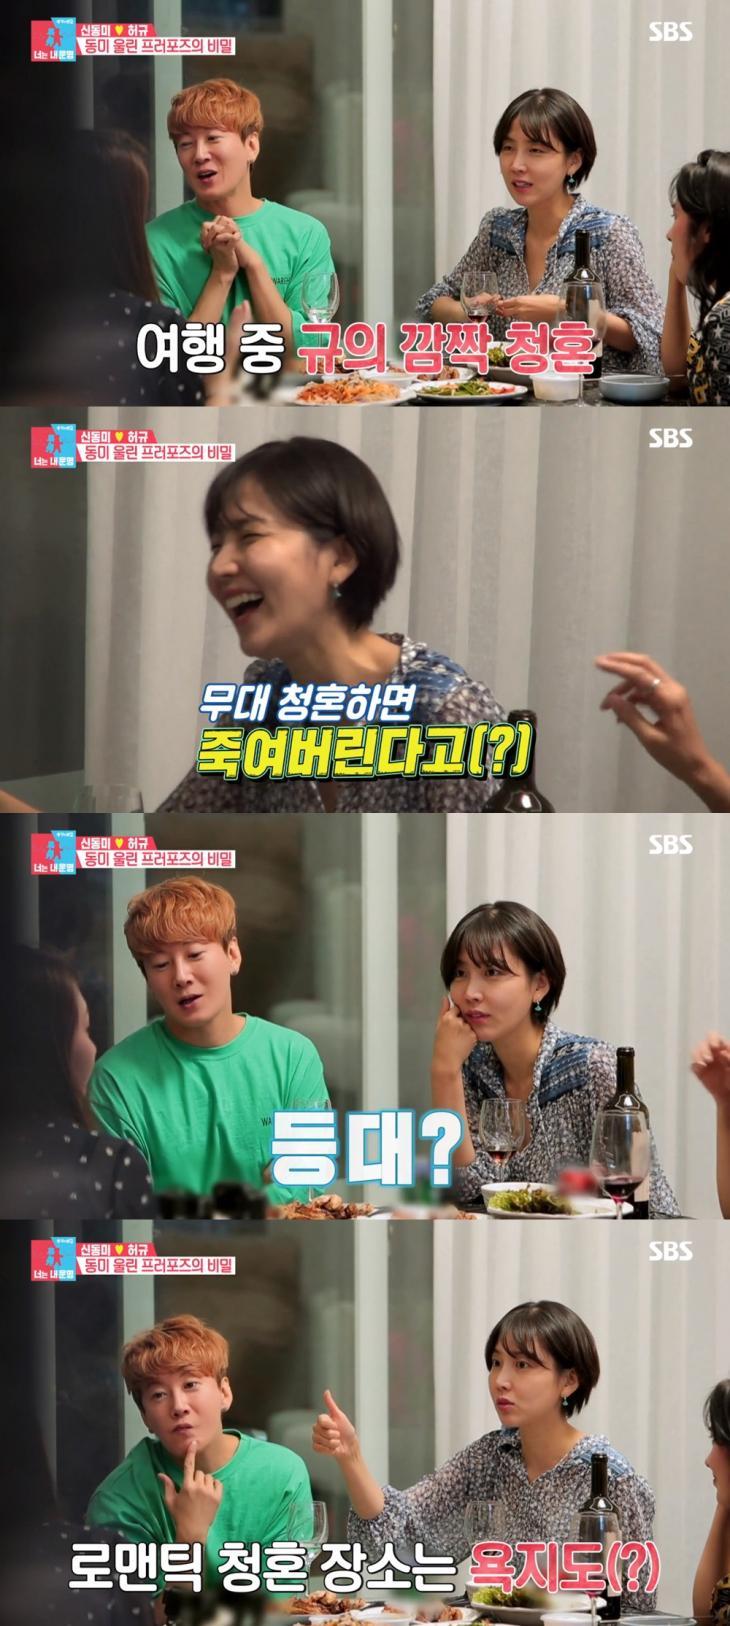 SBS '동상이몽 시즌2-너는 내 운명' 방송 캡처